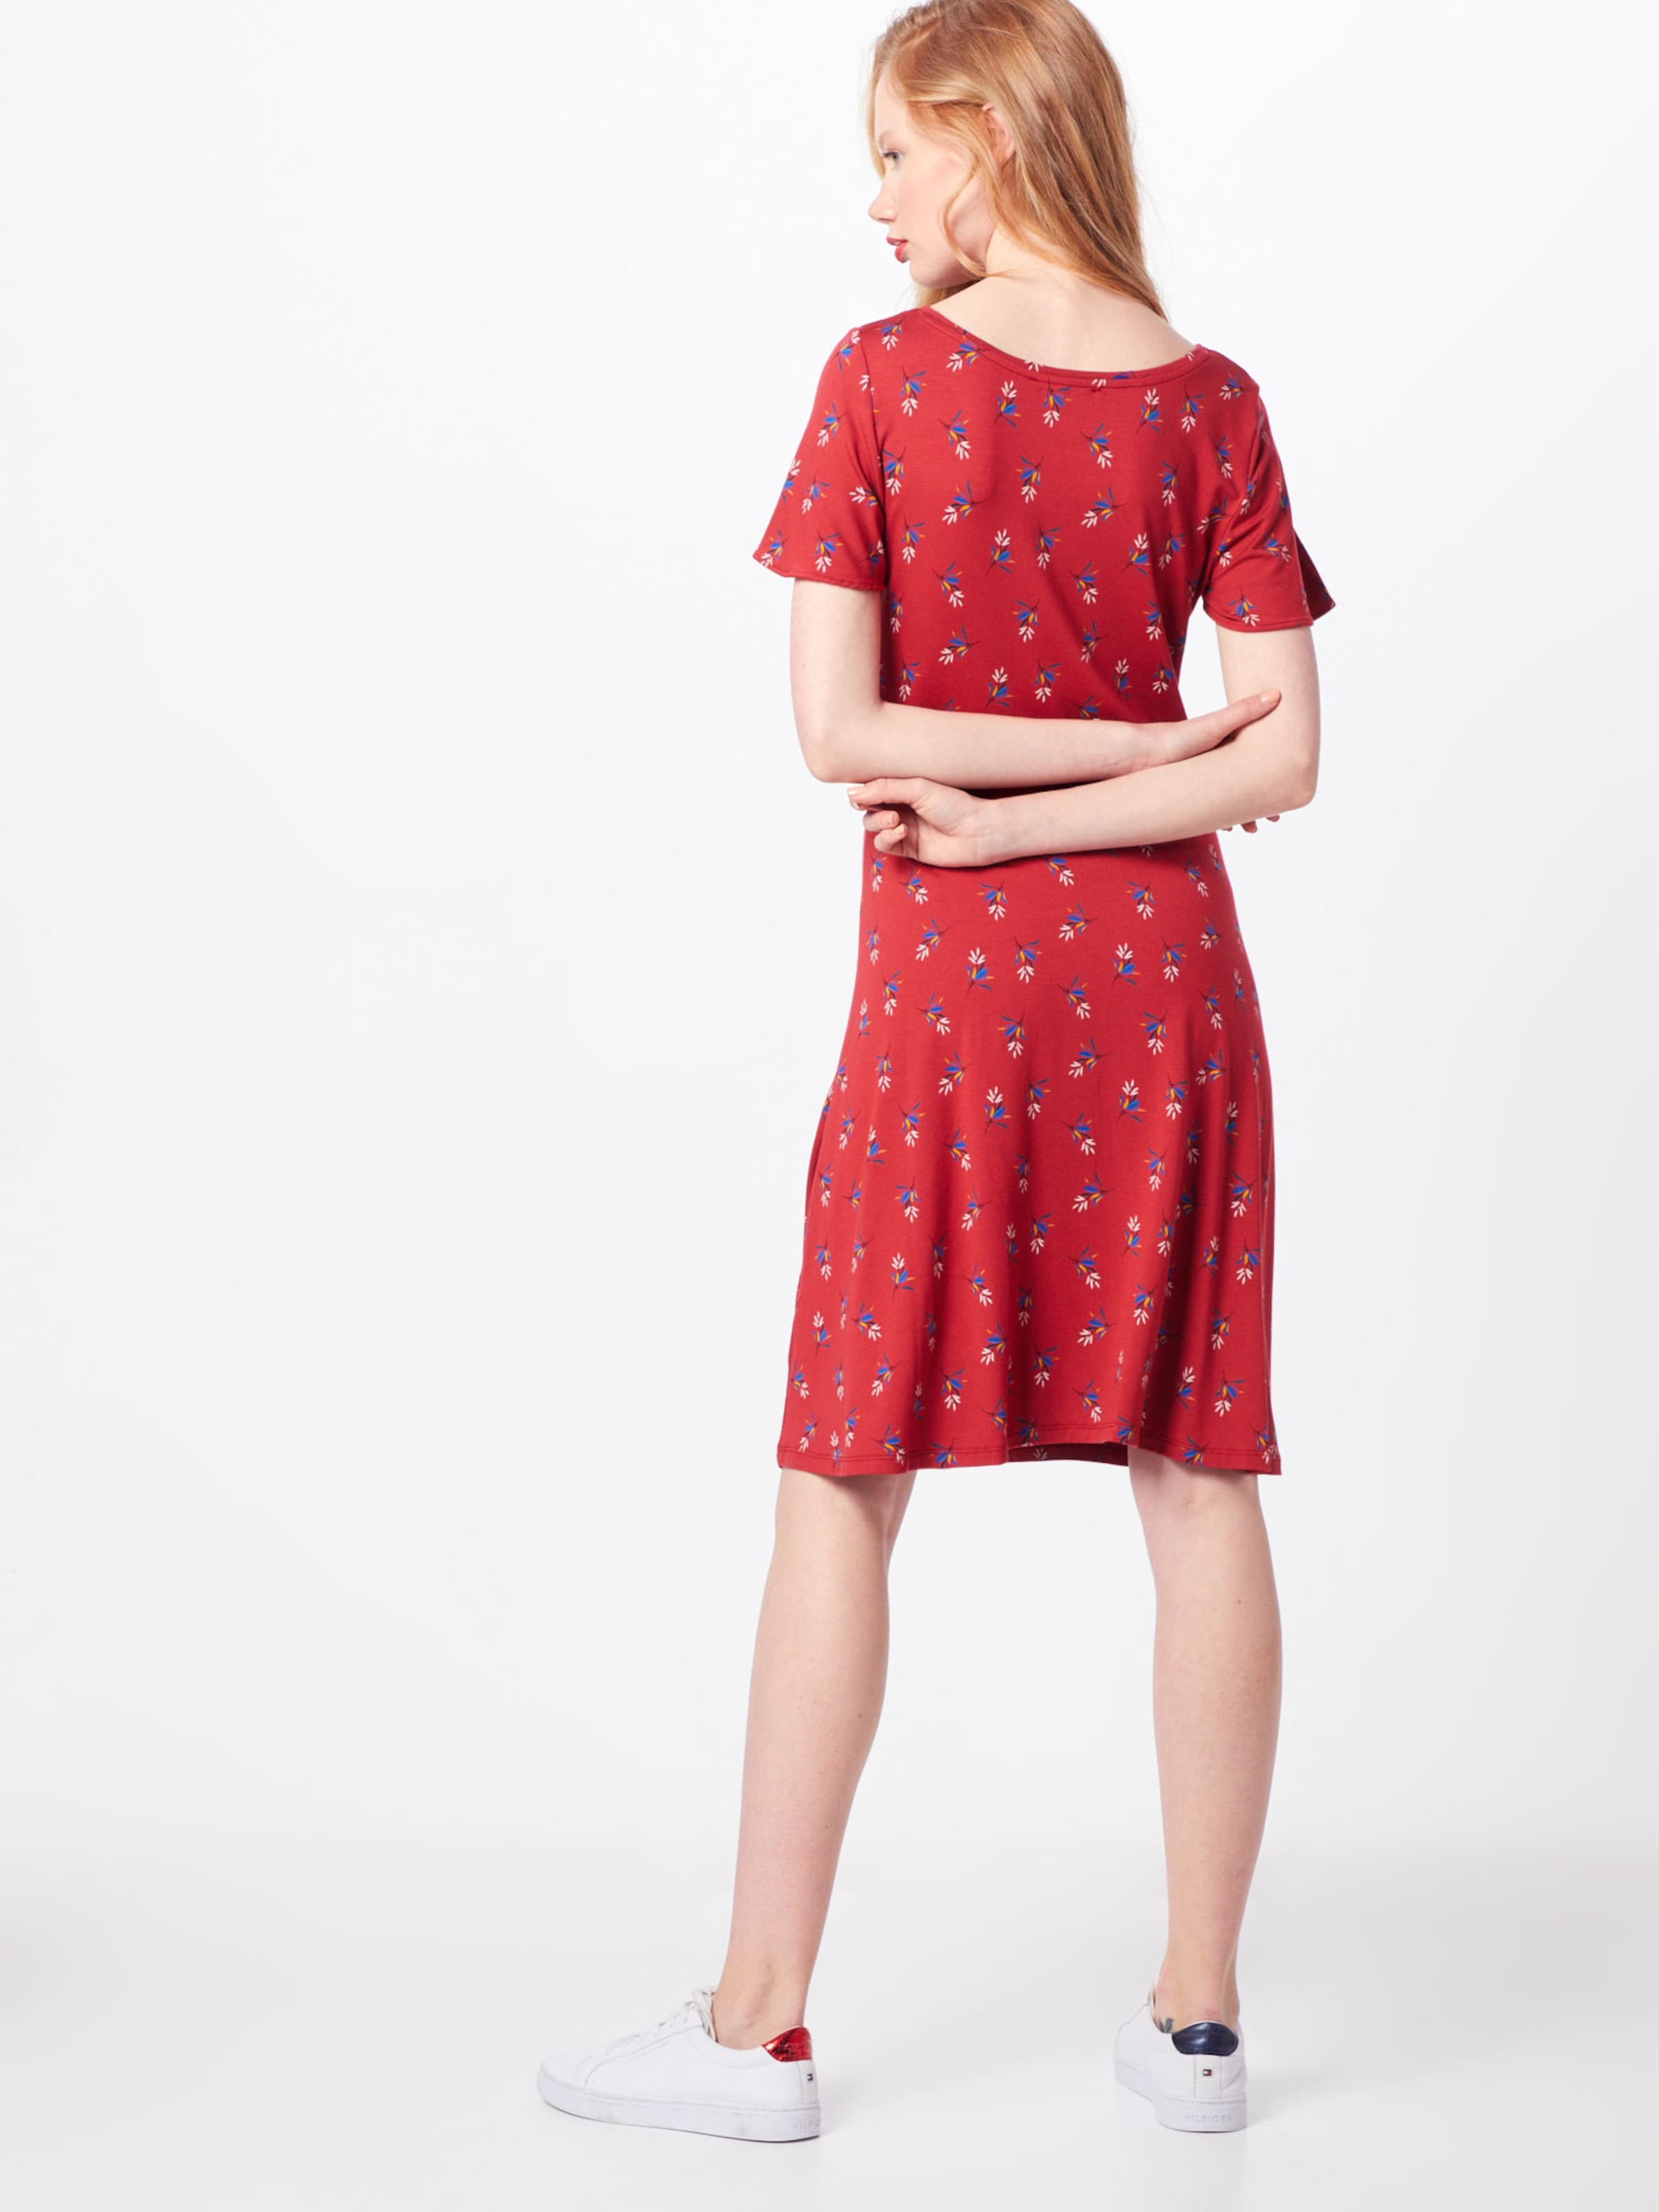 In Esprit In In Kleid Kleid Esprit Rot Rot Esprit Kleid 1Tl3uFKJc